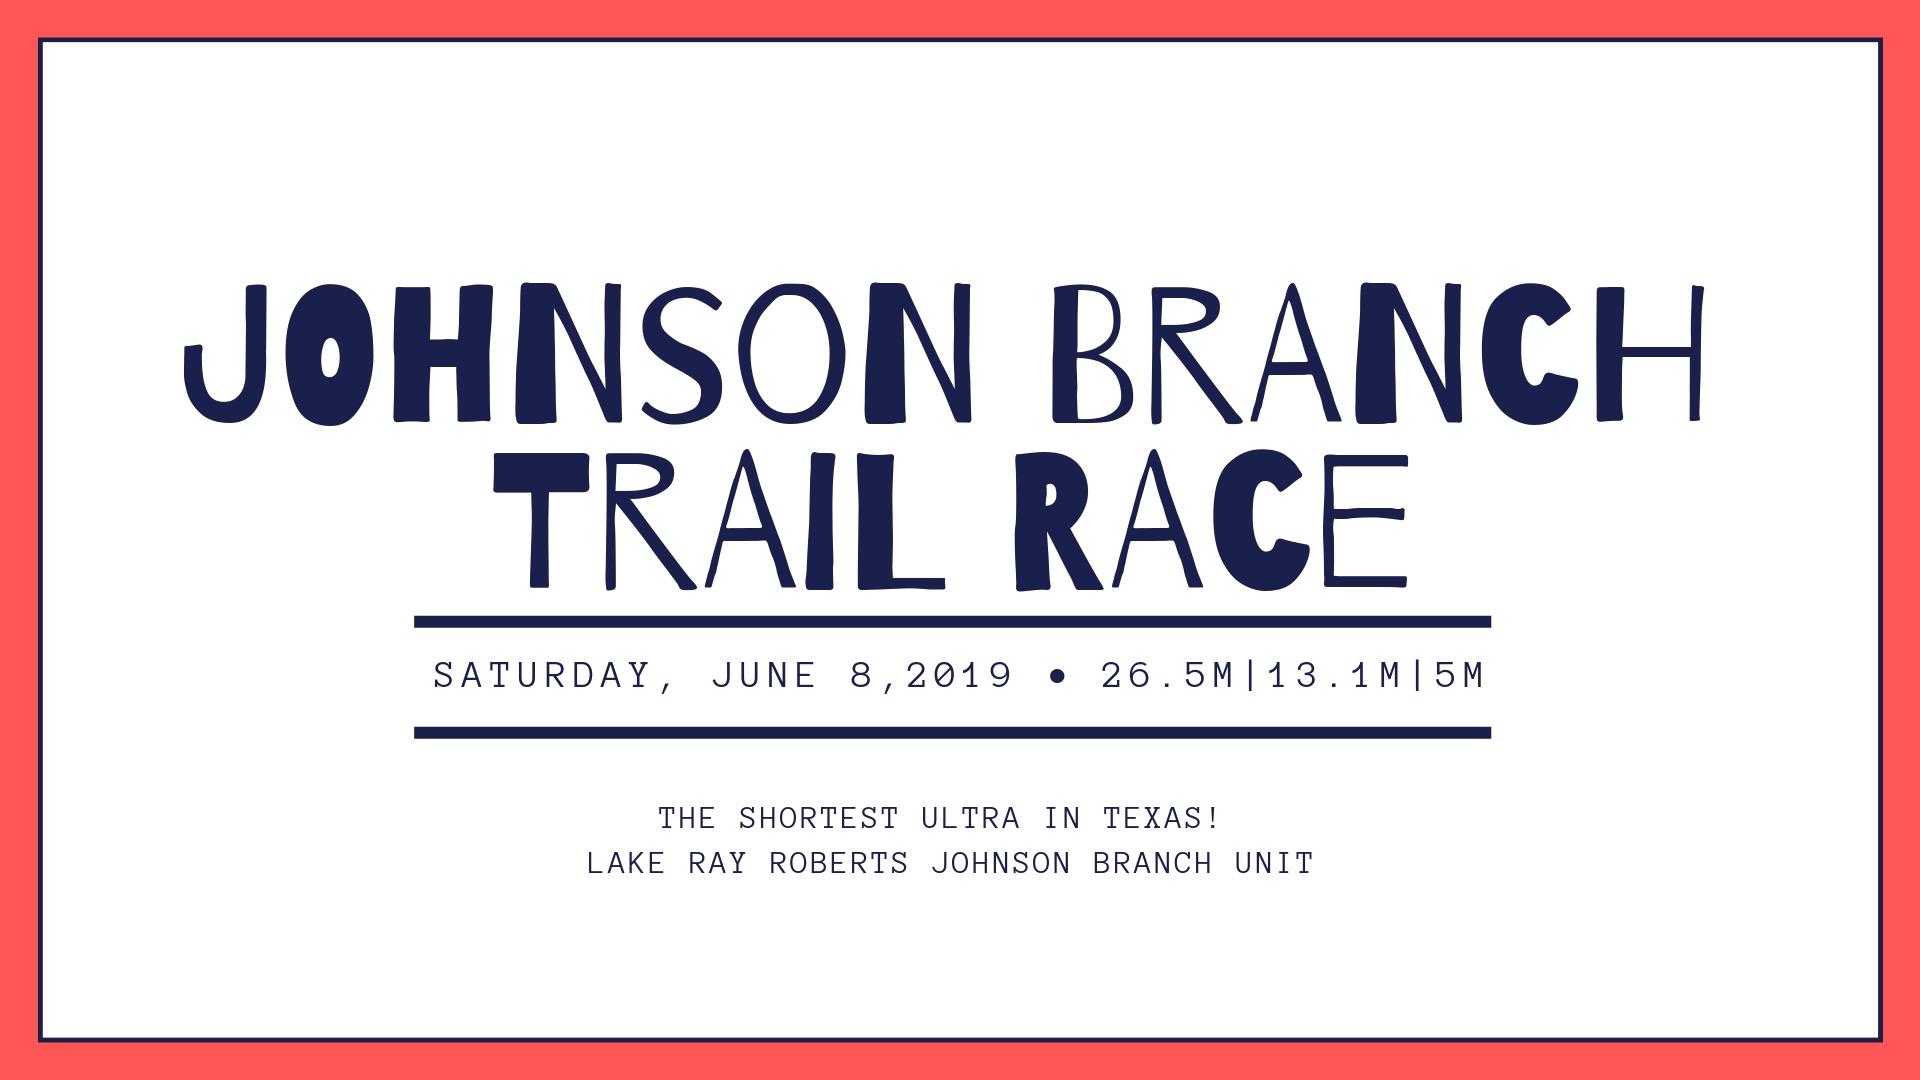 johnson branch trail race.jpg